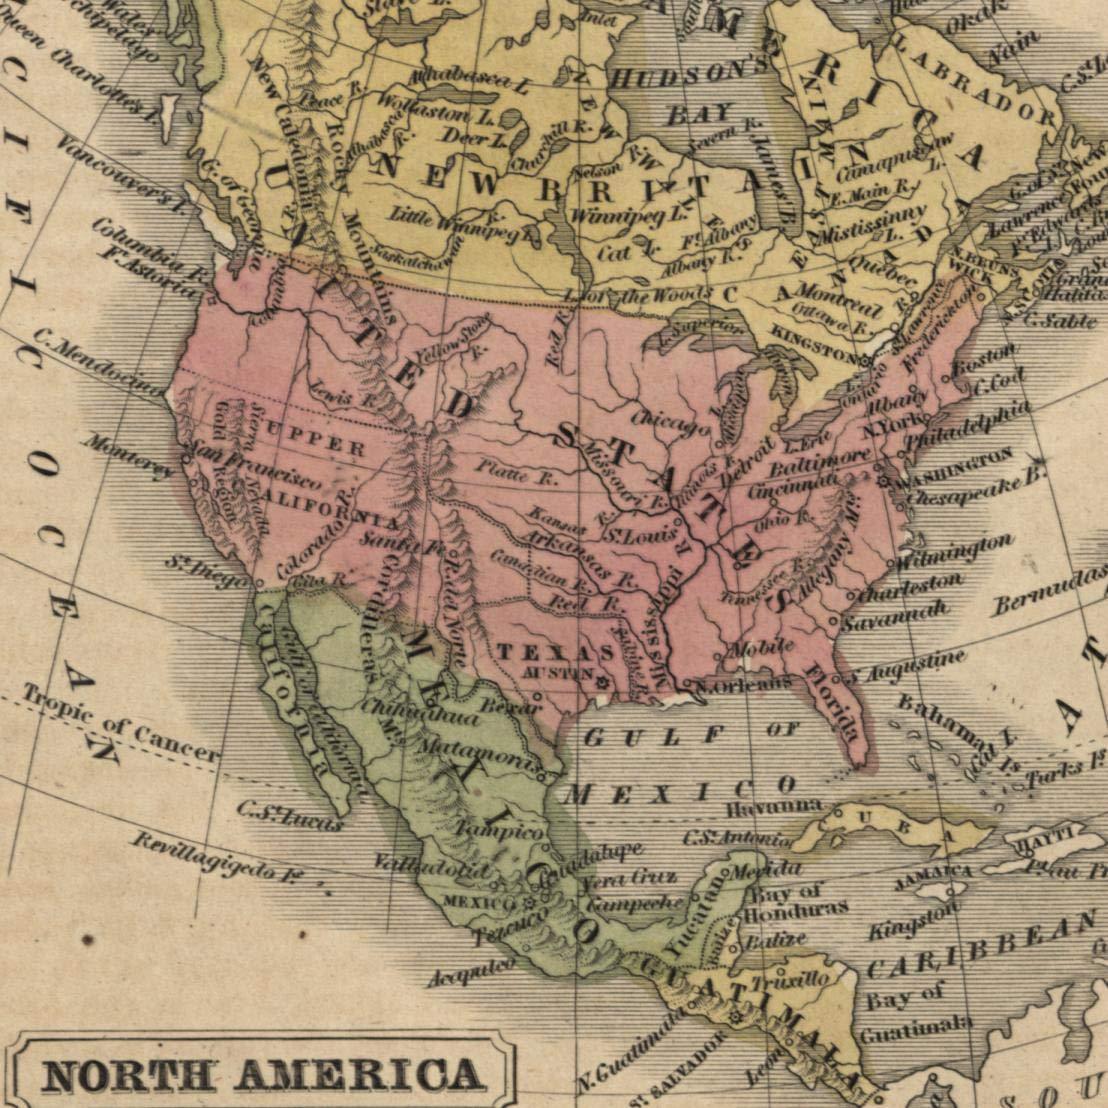 Color Map Of North America.Amazon Com North America Texas Territorial West 1853 Boynton Small